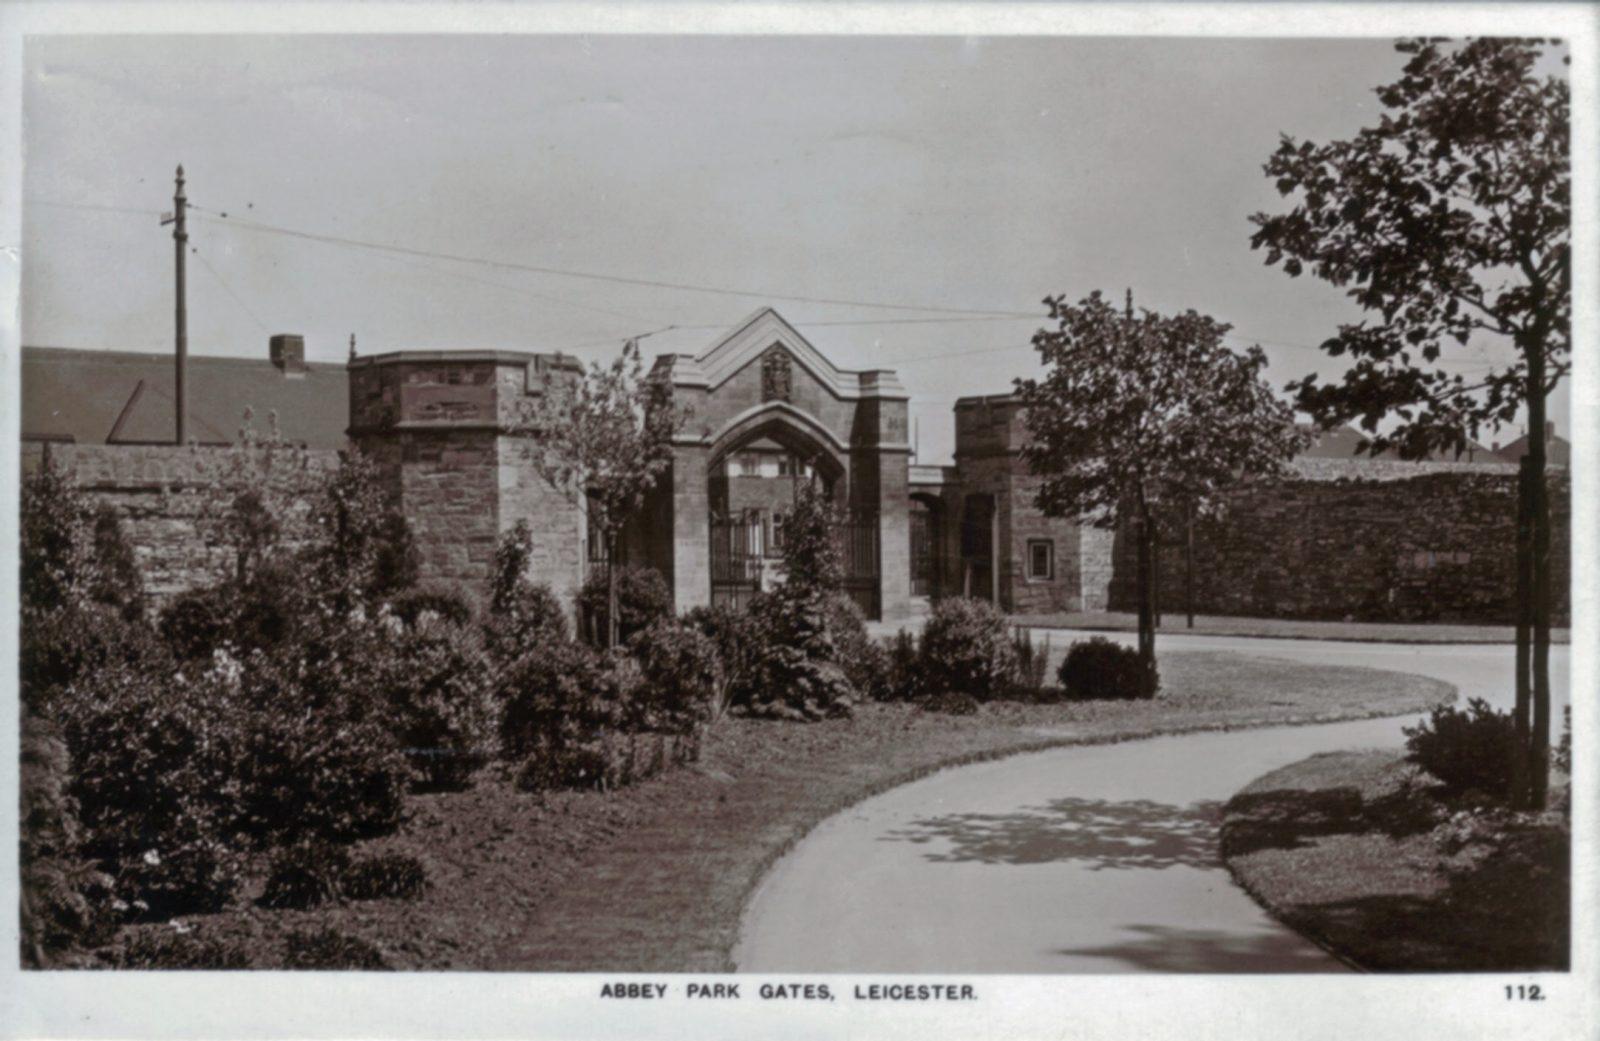 Abbey Park, Leicester. 1941-1960: Entrance gates (different entrance). Franked 1950 (File:1019)